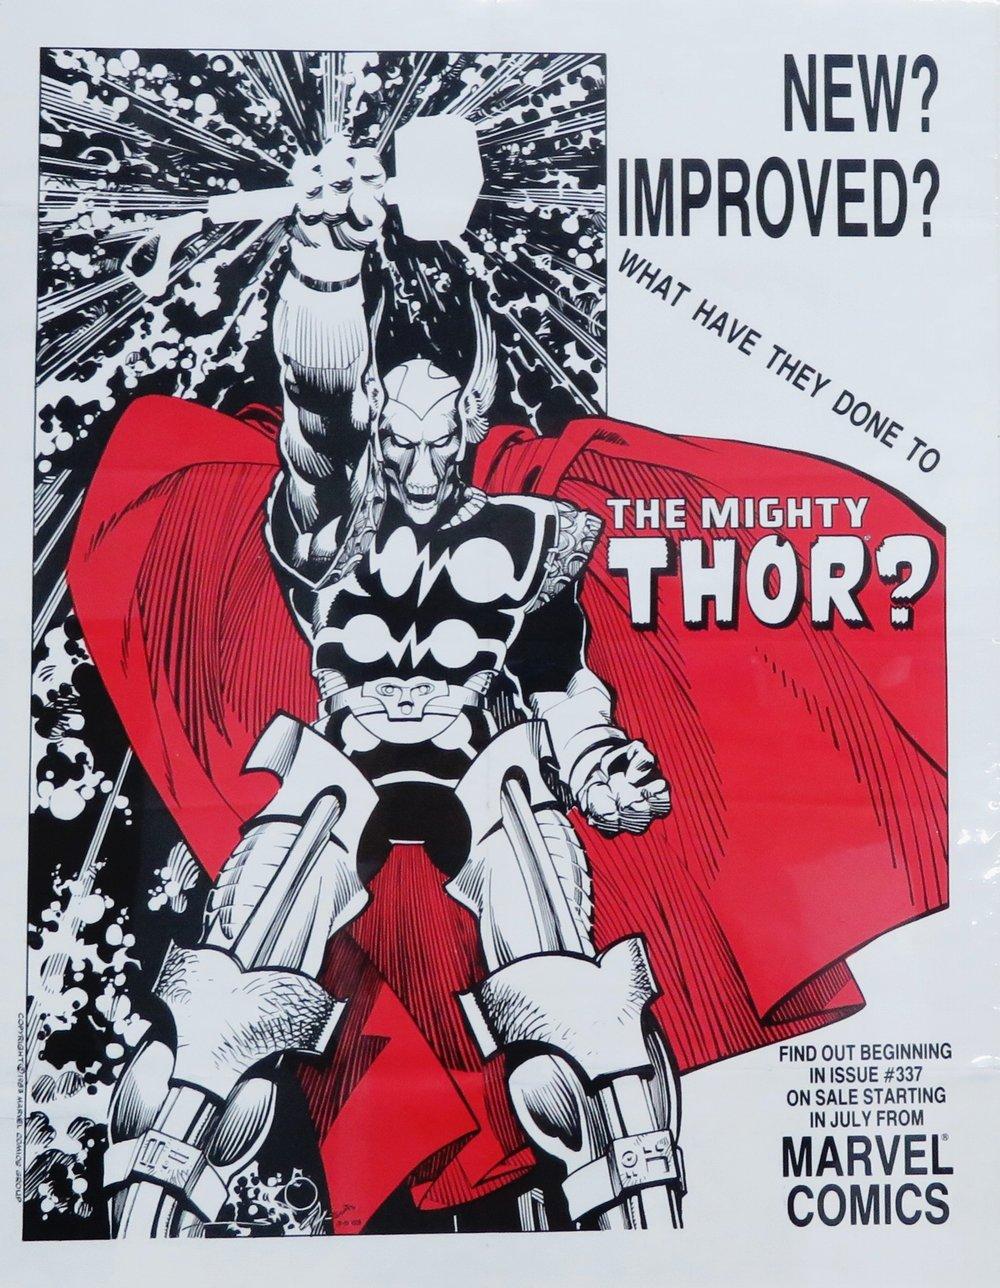 1983 MARVEL COMICS POSTER